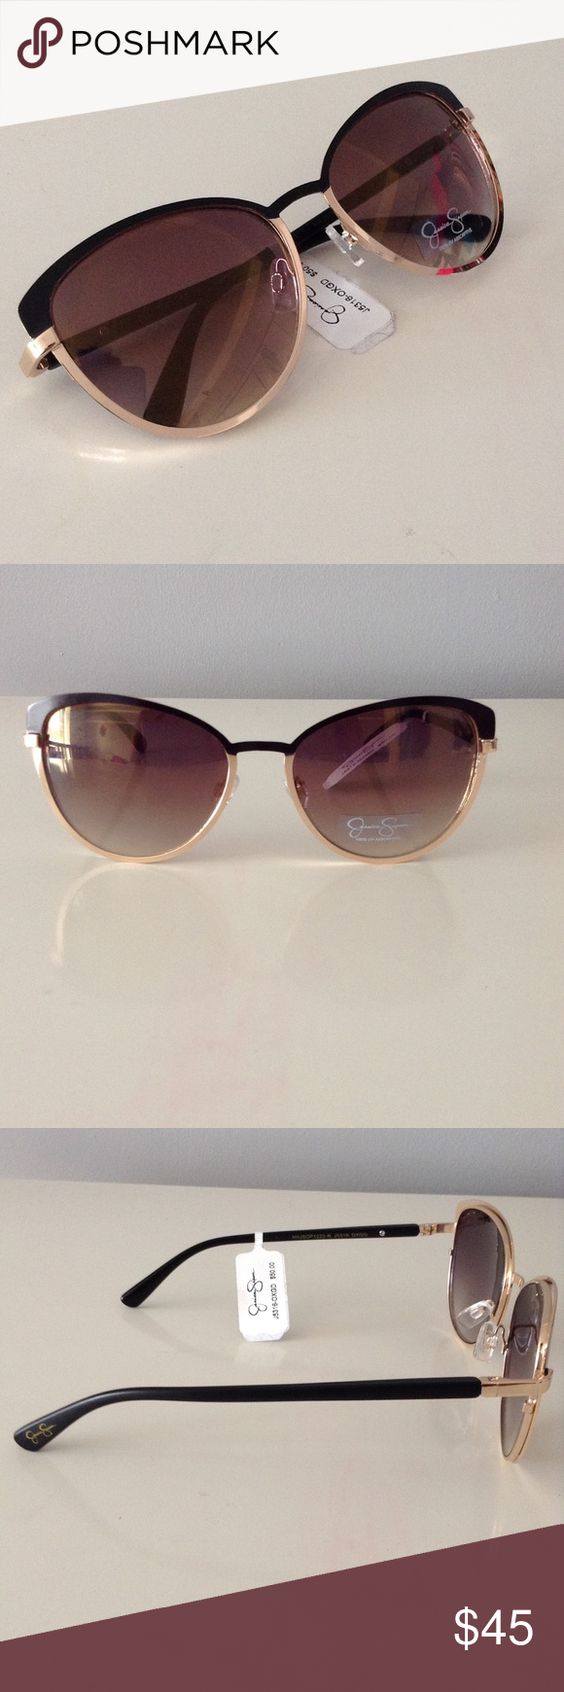 Chic Round Black & Gold Sunglasses New Jessica Simpson Accessories Sunglasses